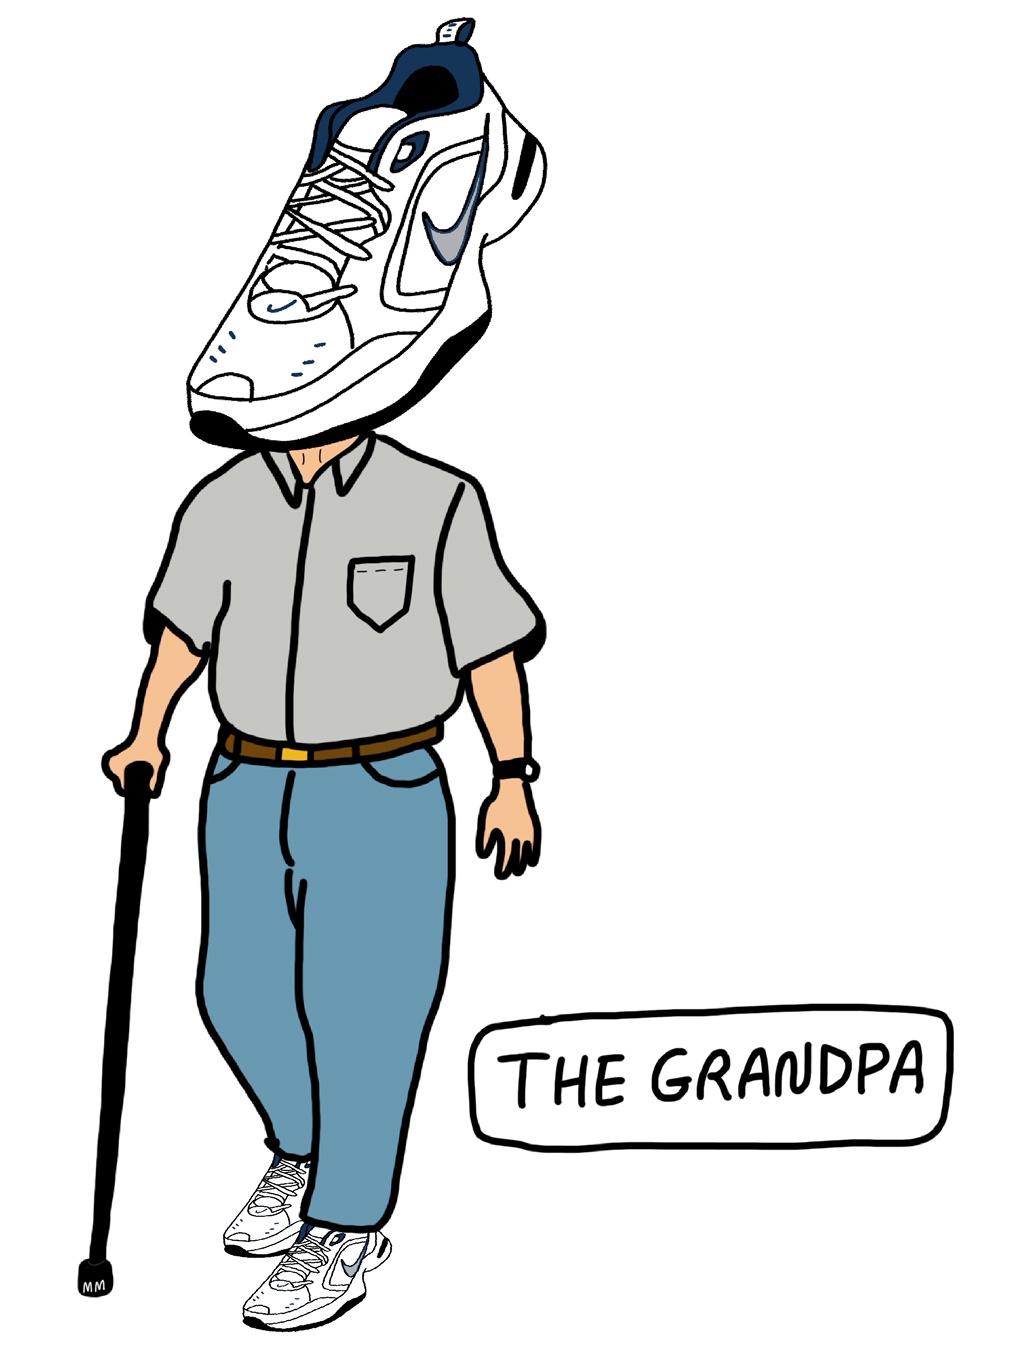 Sneaker Head: Grandpa